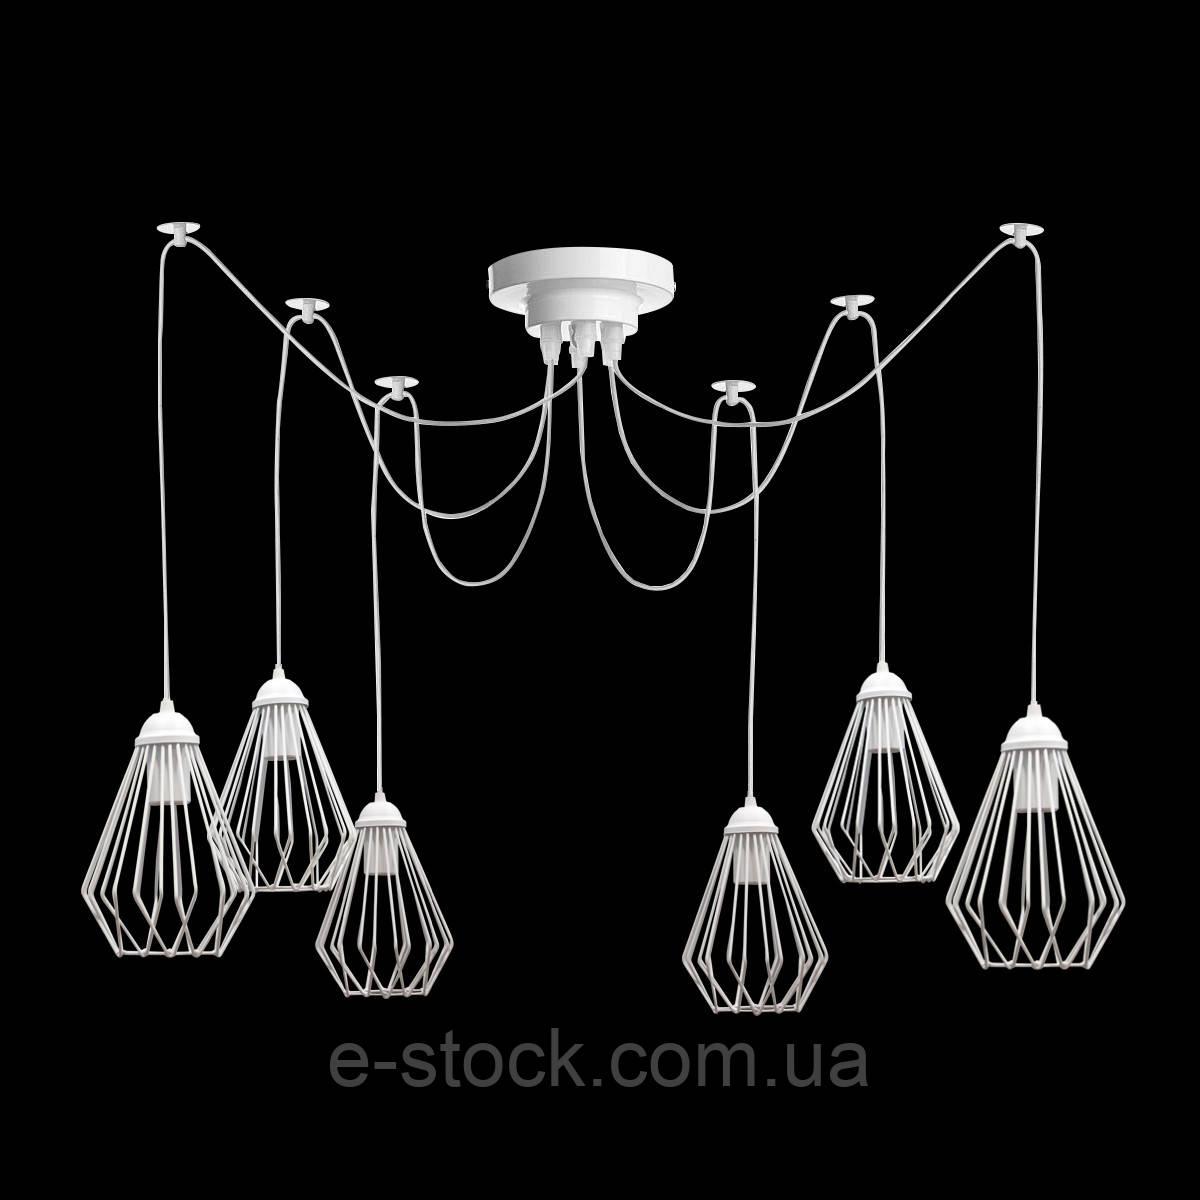 Люстра паук на восемь плафонов NL 05371-8 W  MSK Electric